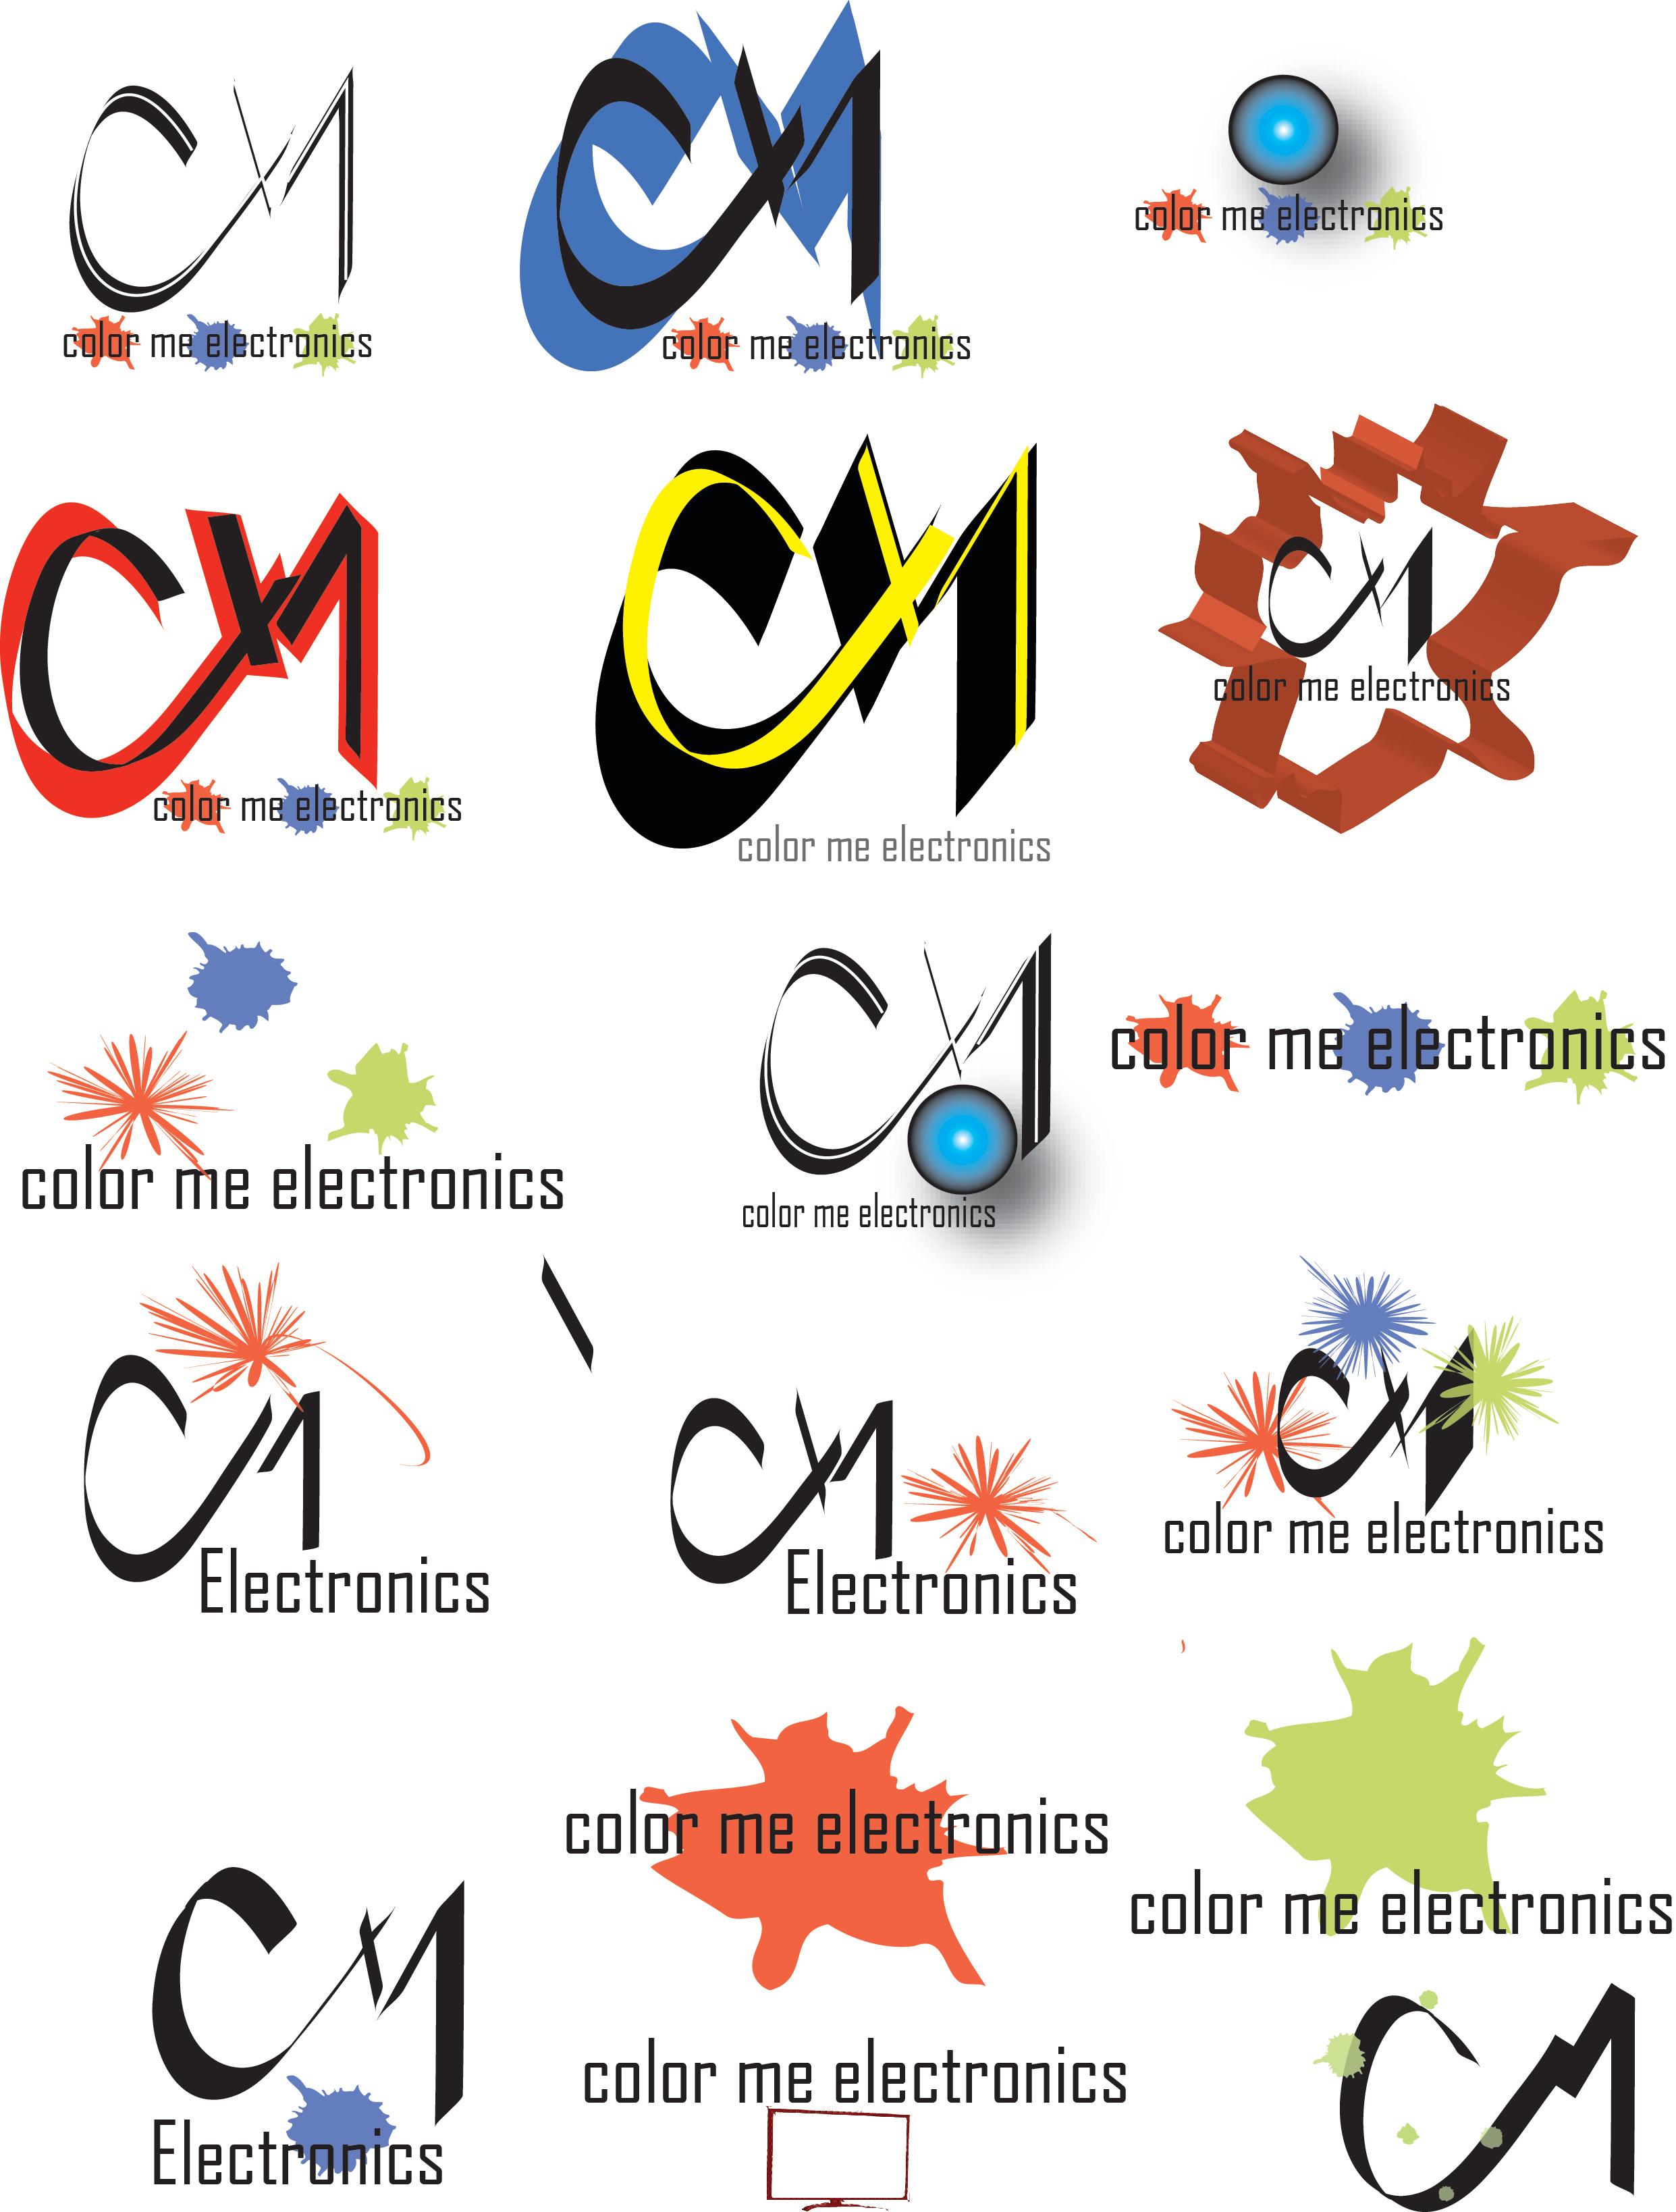 cm electronics logos